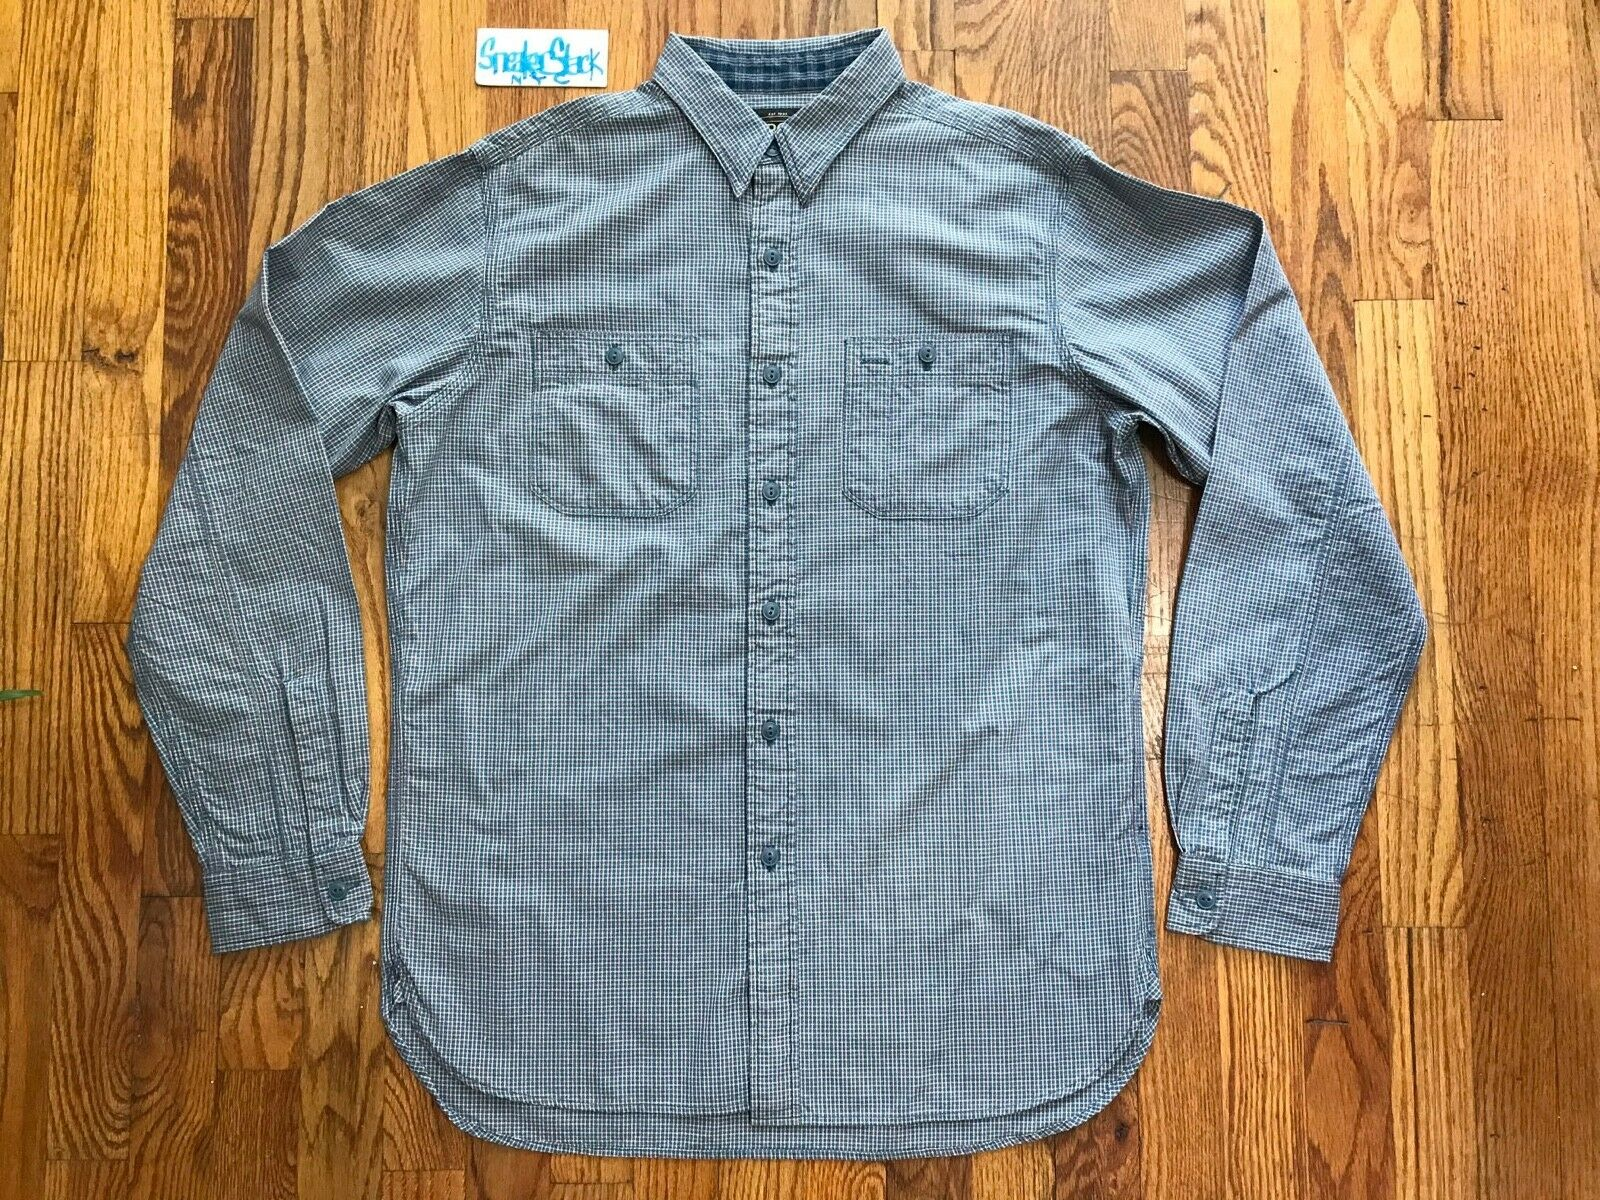 Vintage RRL Ralph Lauren Long Sleeve Button Down Shirt Blau Weiß rot Mens Sz M